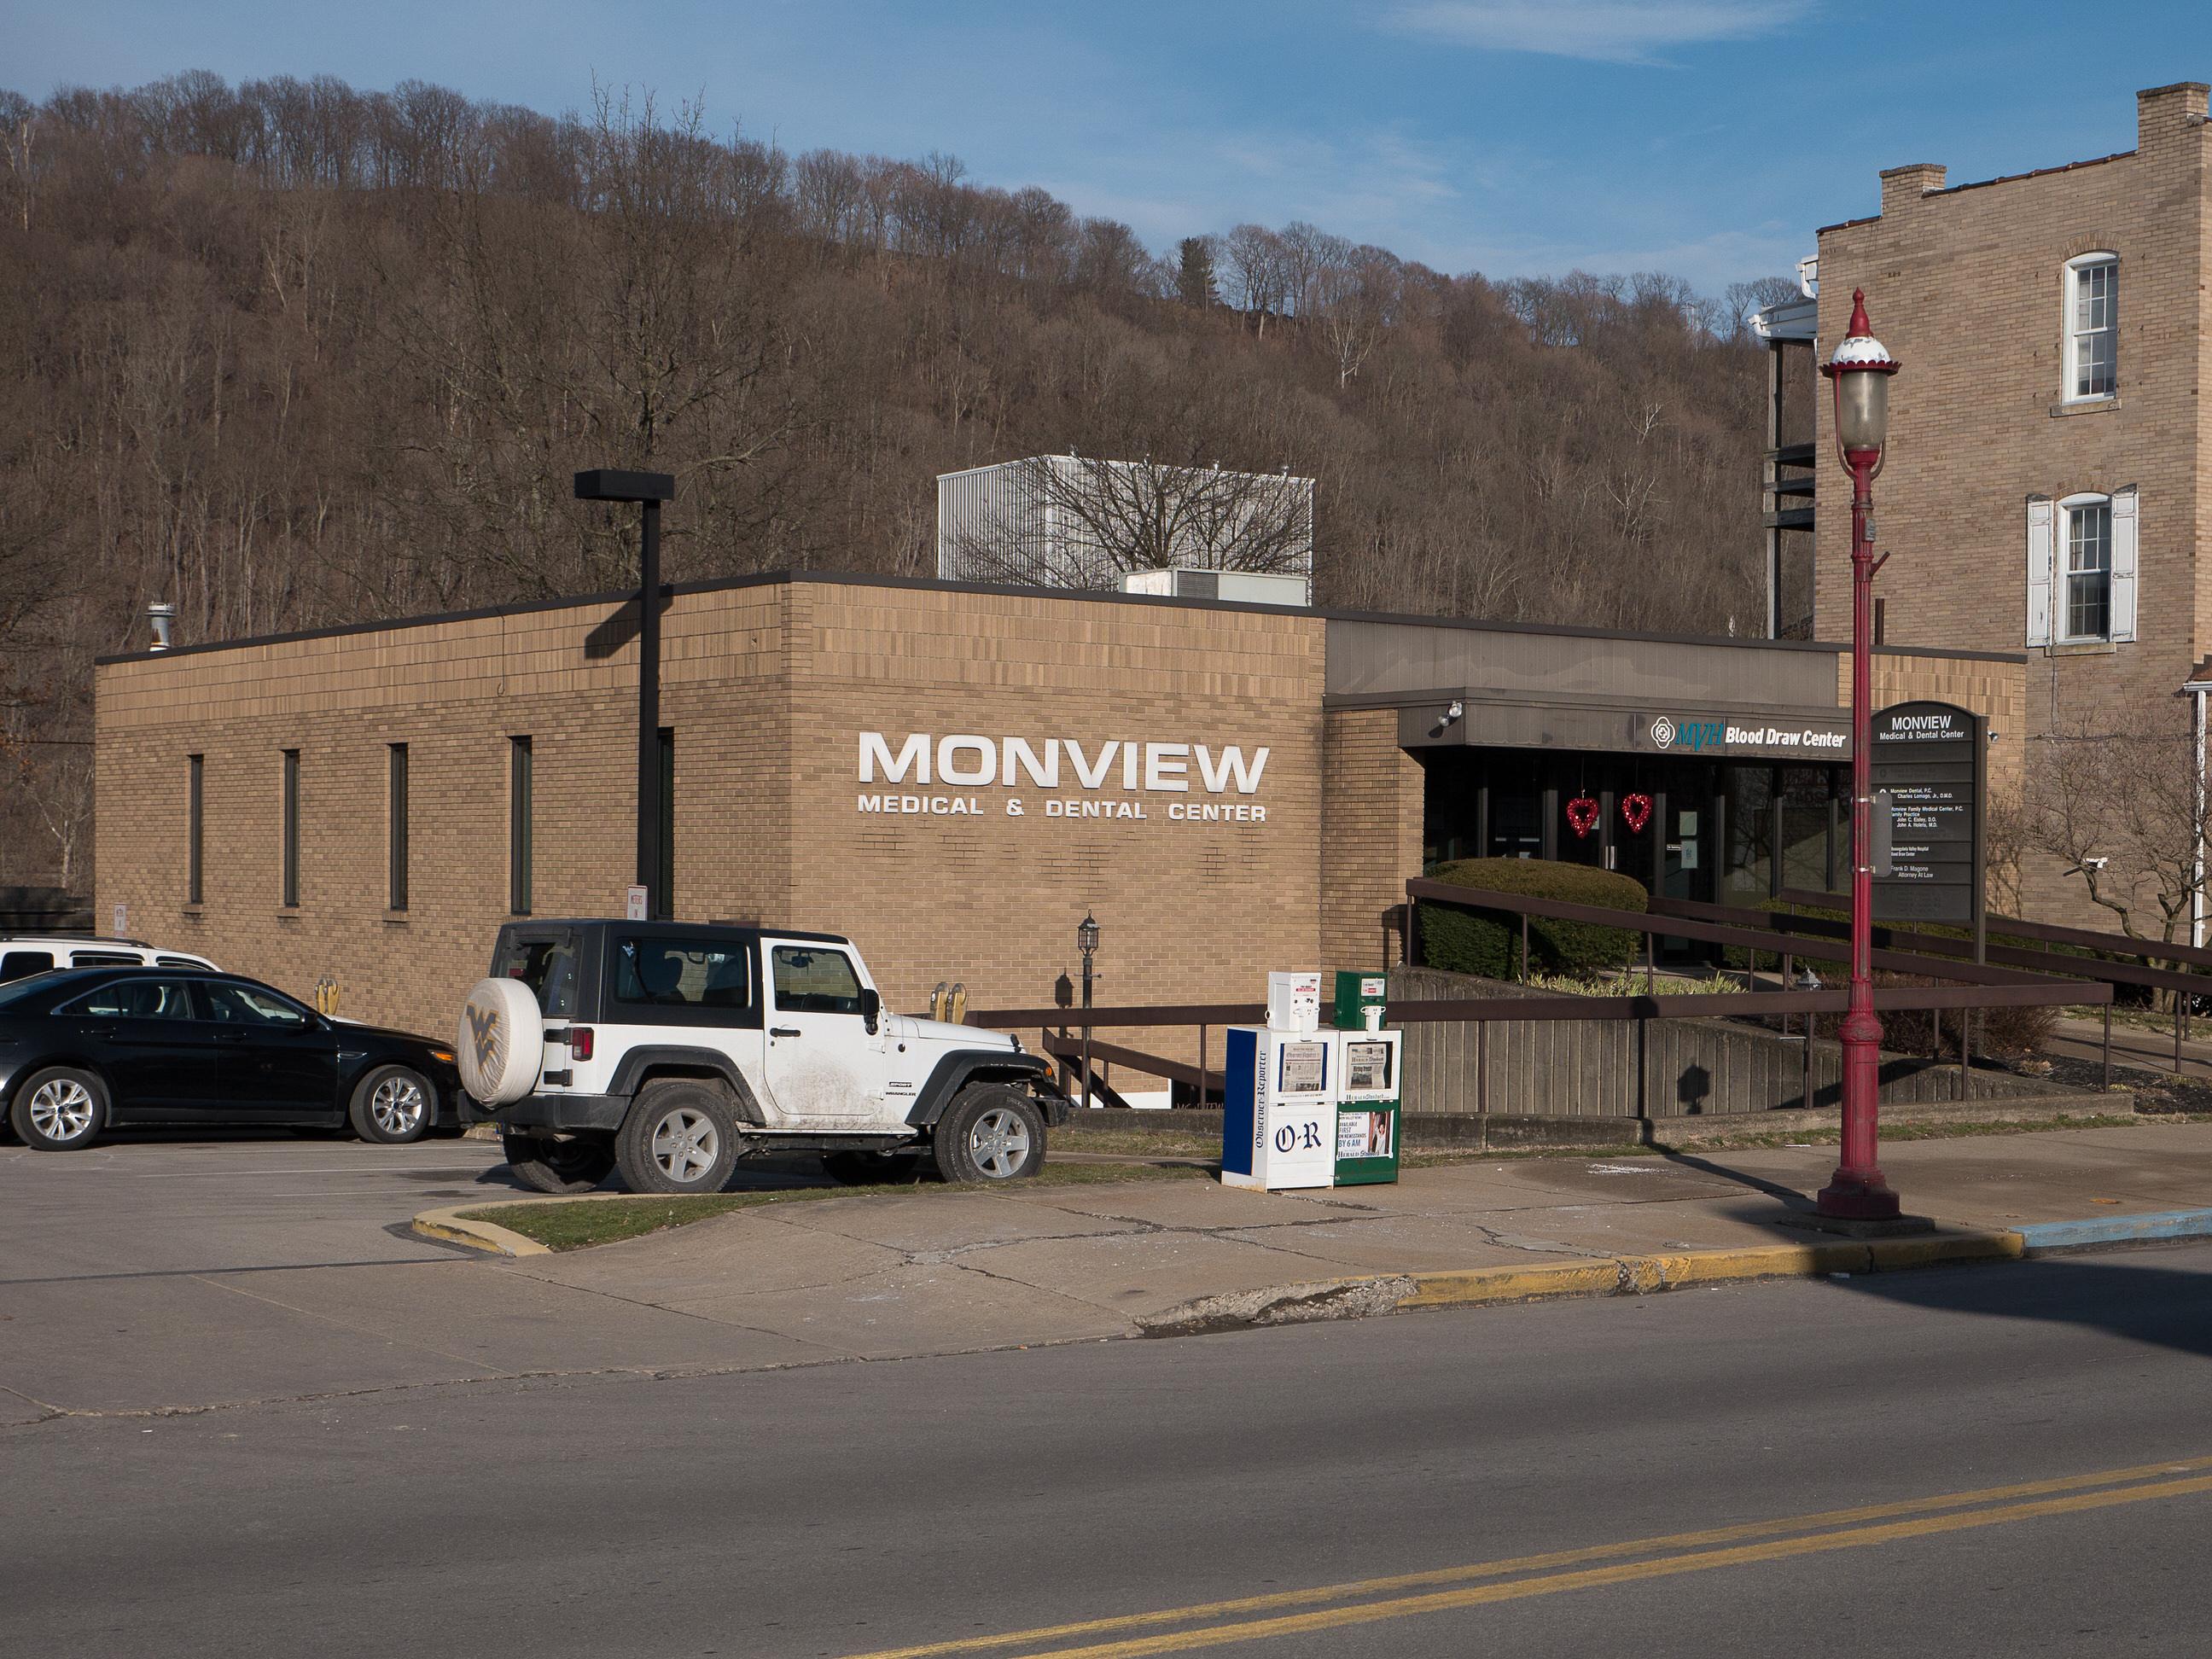 Photo of building at 447 West Main Street, Monongahela, Pa. 15063 along rt 88 and rt 136. Photo property of the Monongahela Main Street Program.